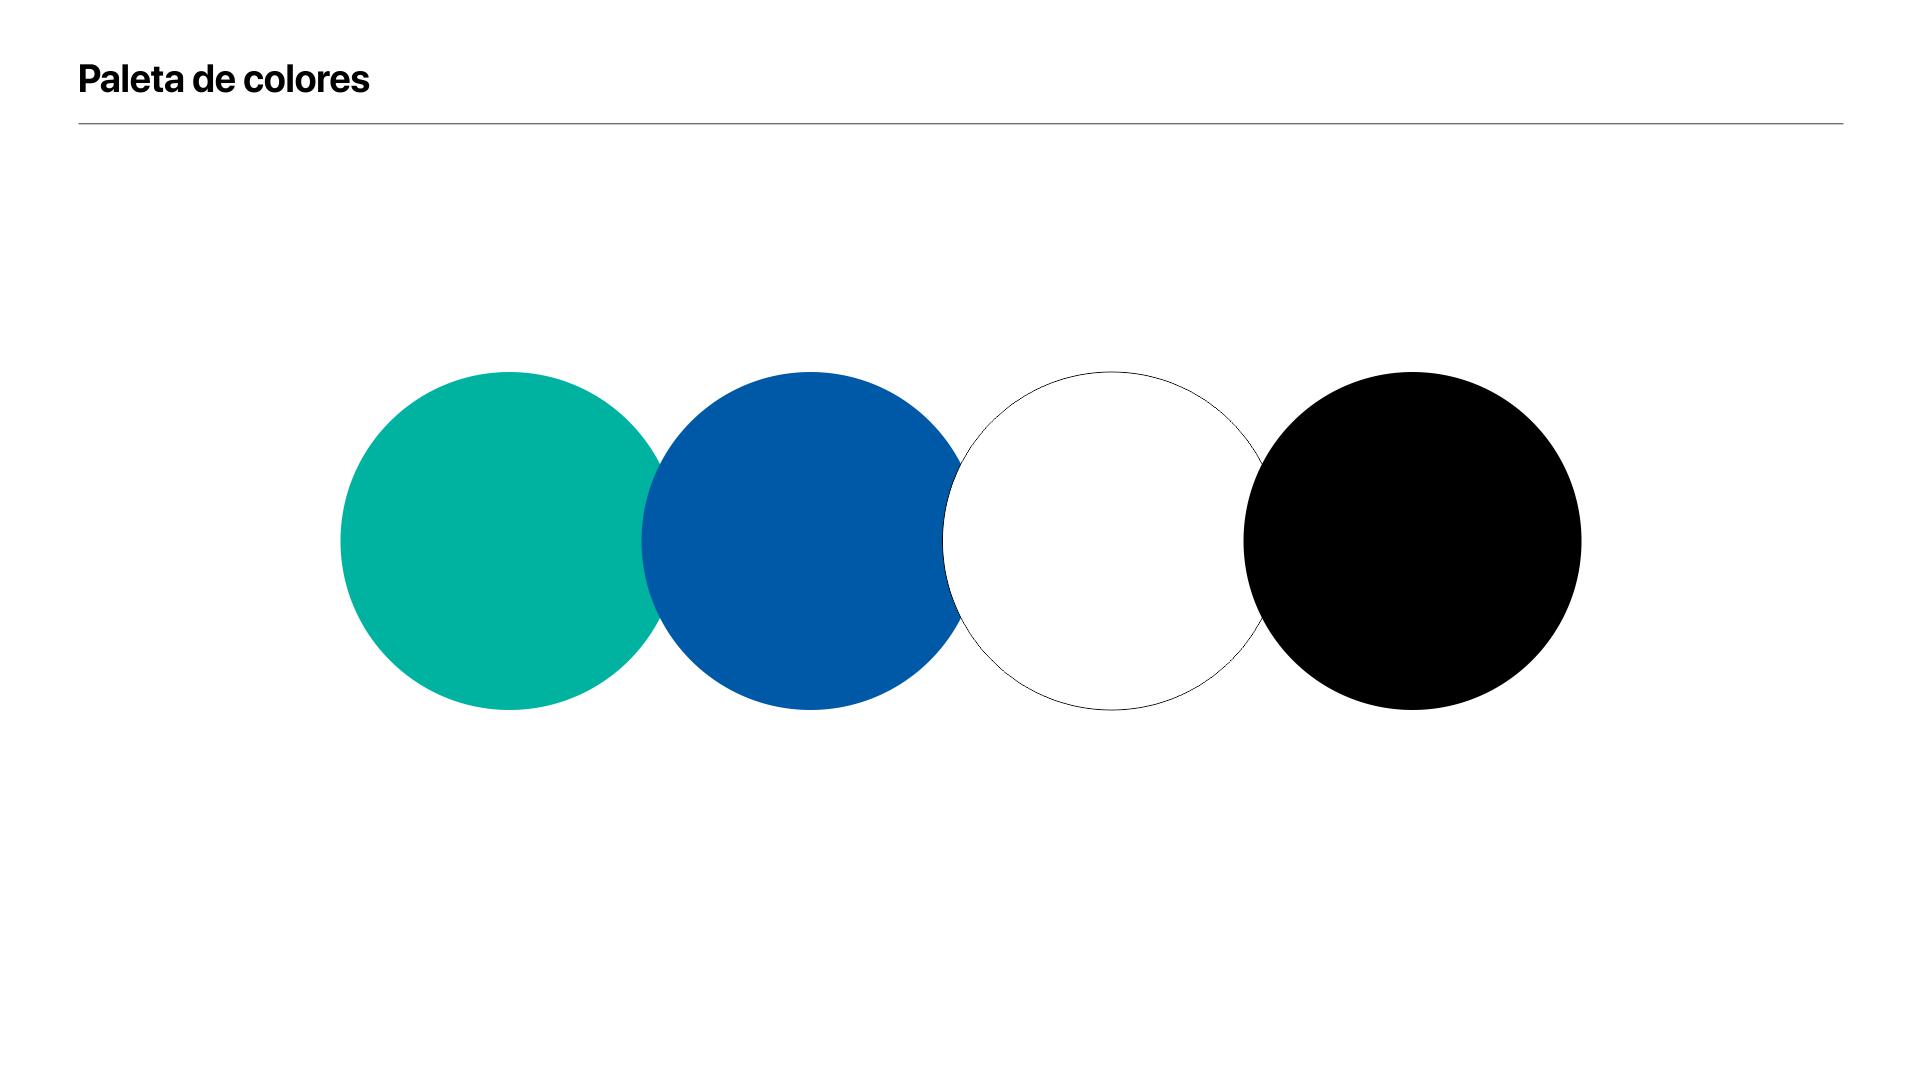 Paleta de colores QuickUp